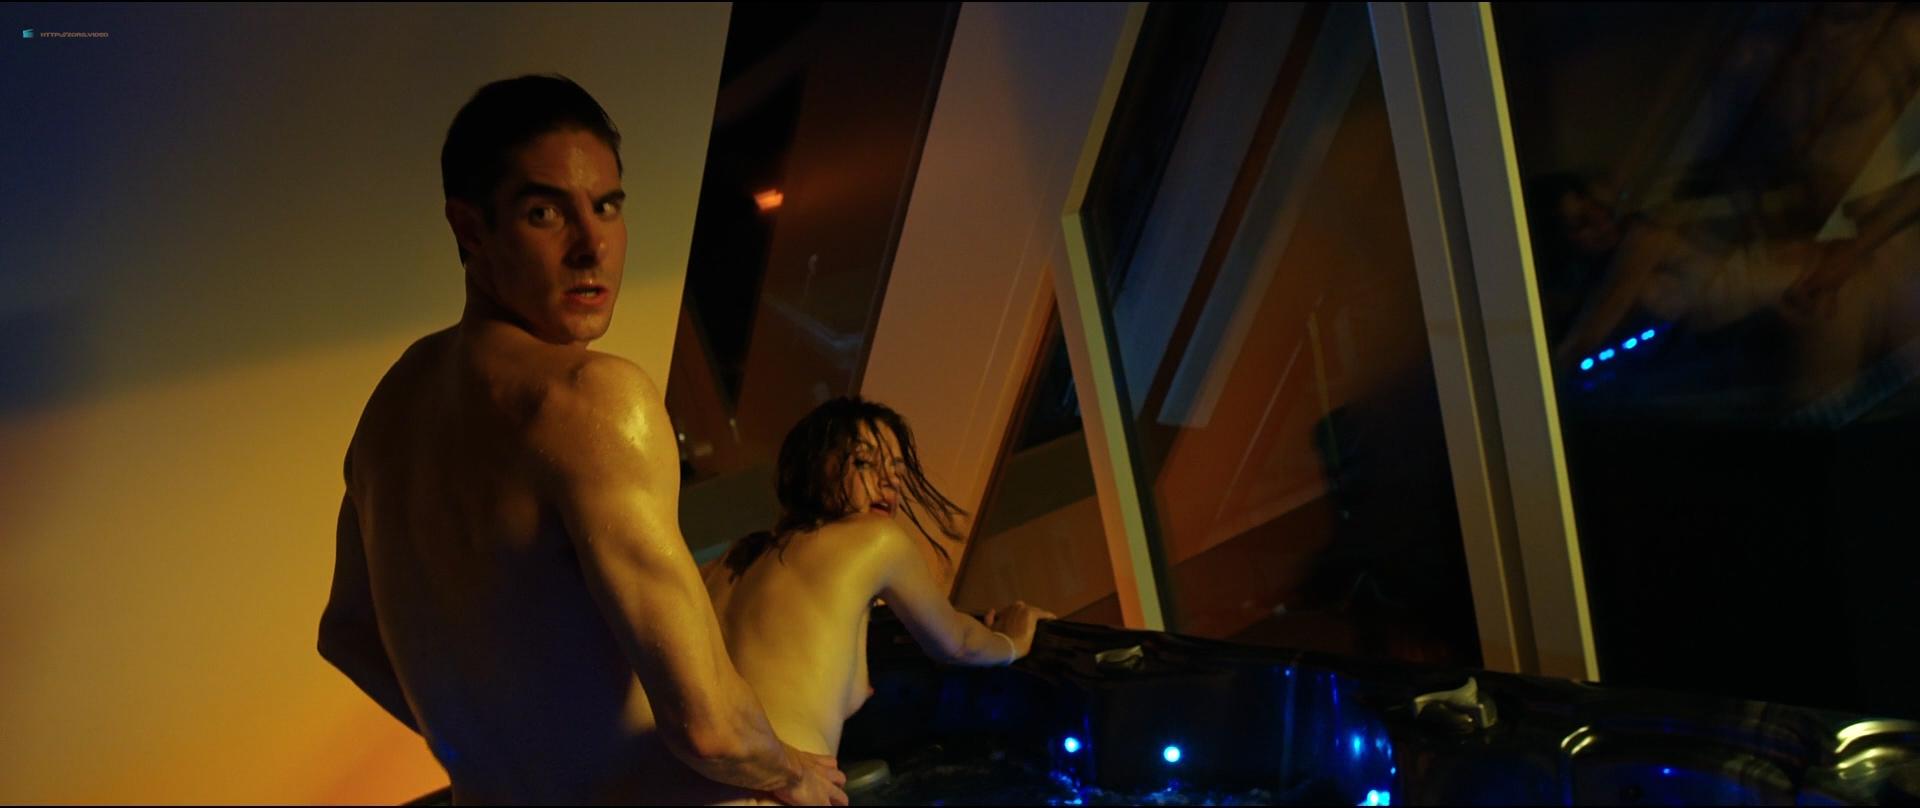 Holly Mae Brood hot and sexy Carolien Spoor, Marly van der Velden nude sex - Sneekweek (NL-2016) HD 1080p BluRay (9)